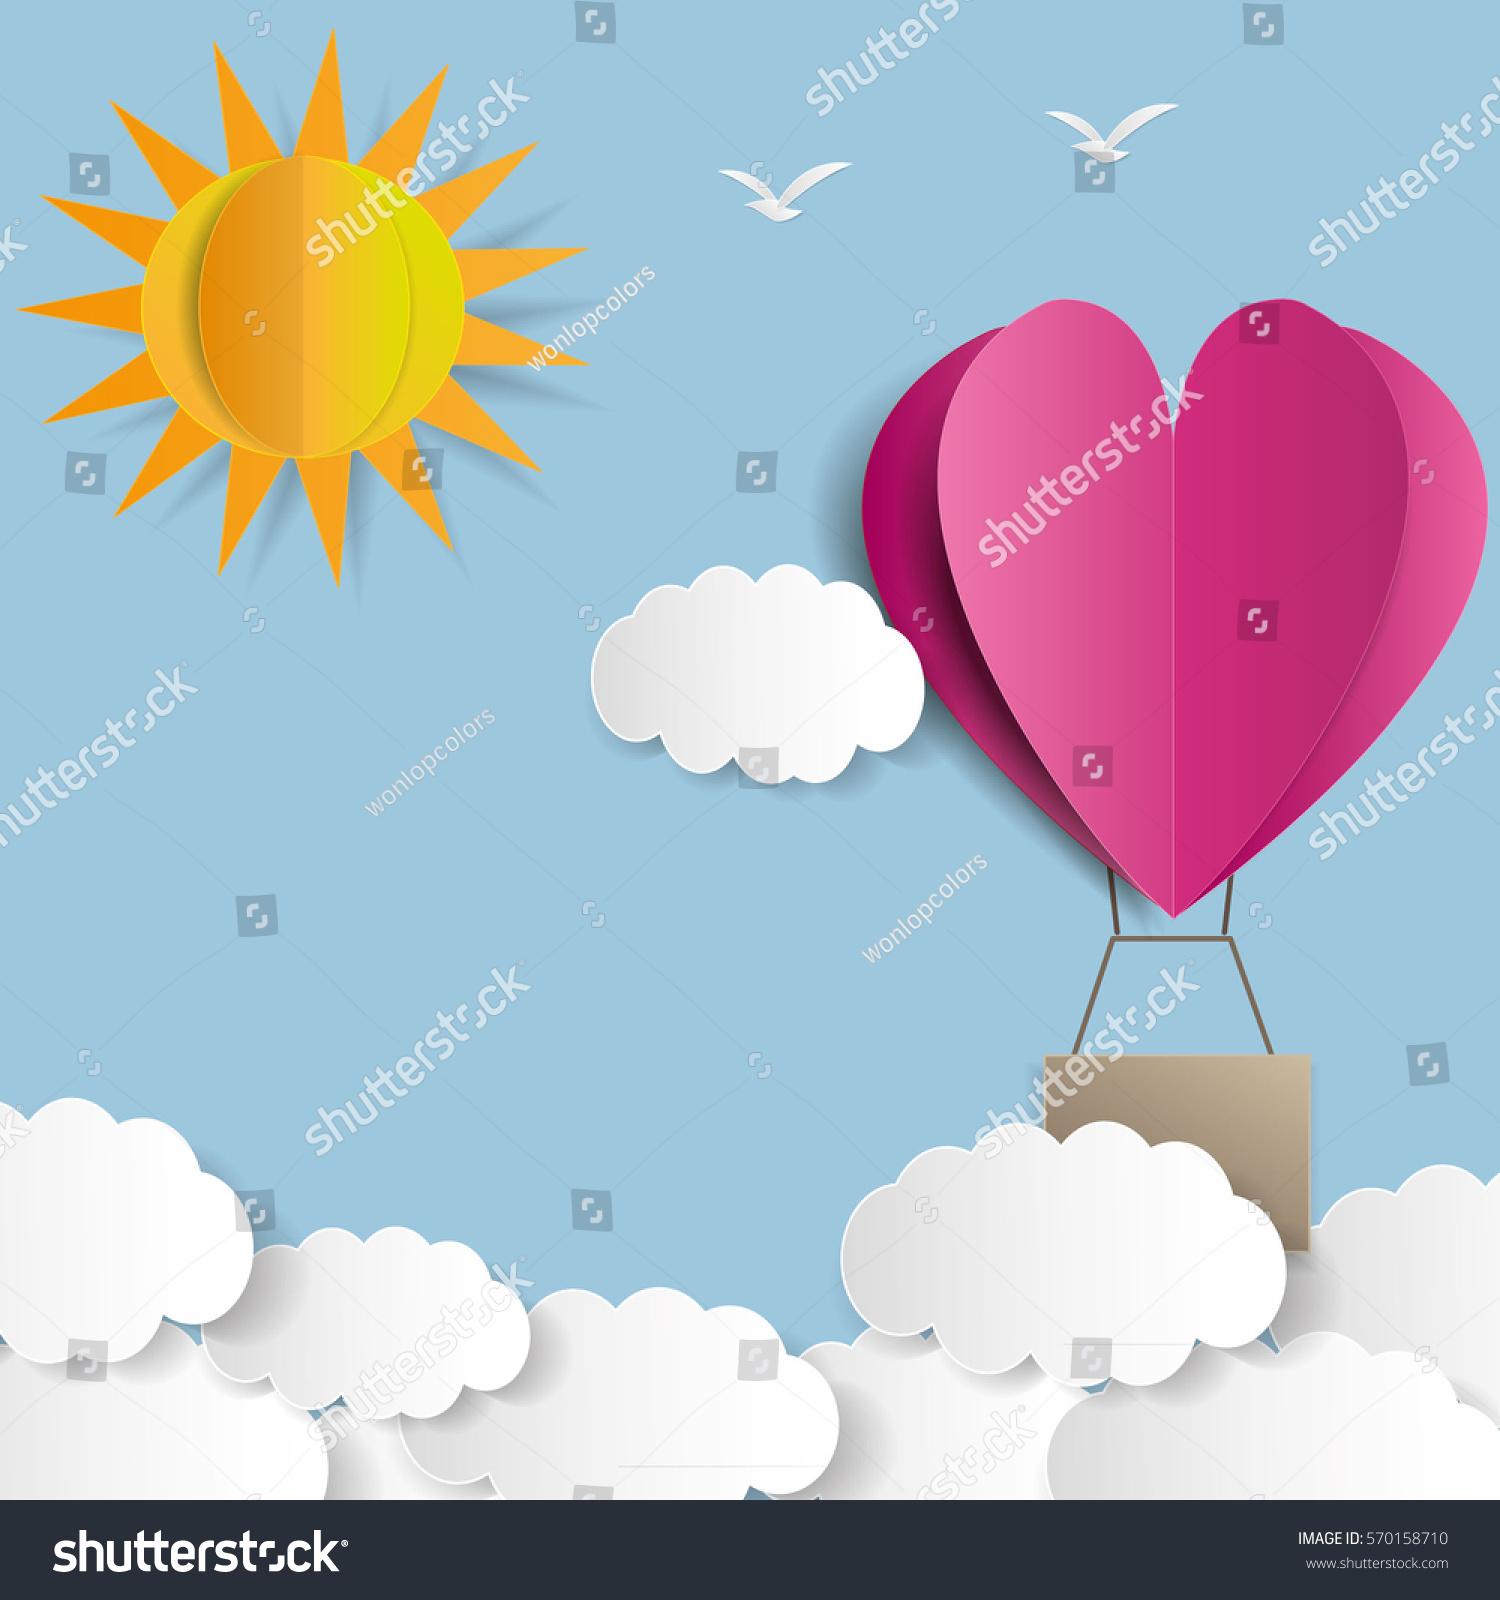 Origami made hot air balloon heart stock vector 570158710 origami made hot air balloon in a heart shape jeuxipadfo Choice Image